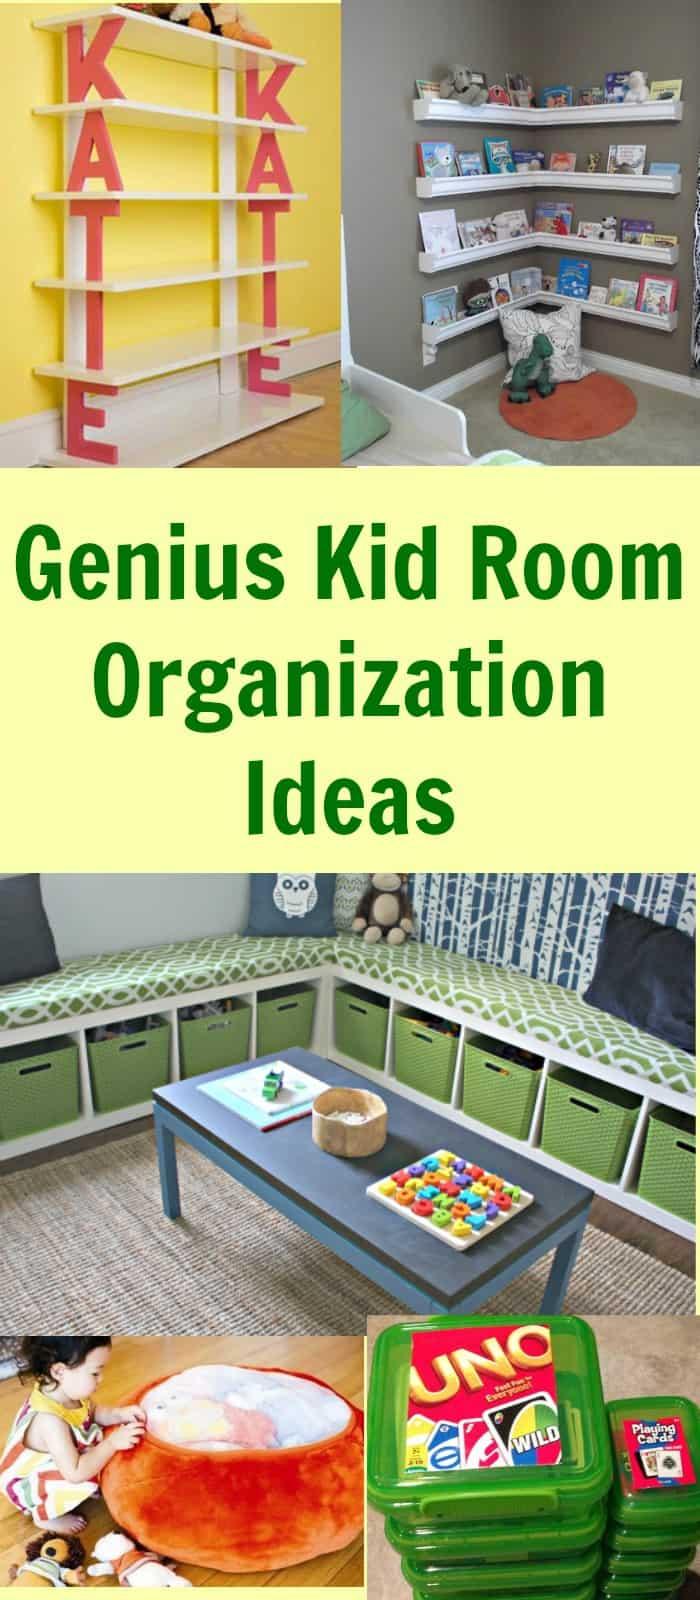 Genius Kid Room Organization Ideas